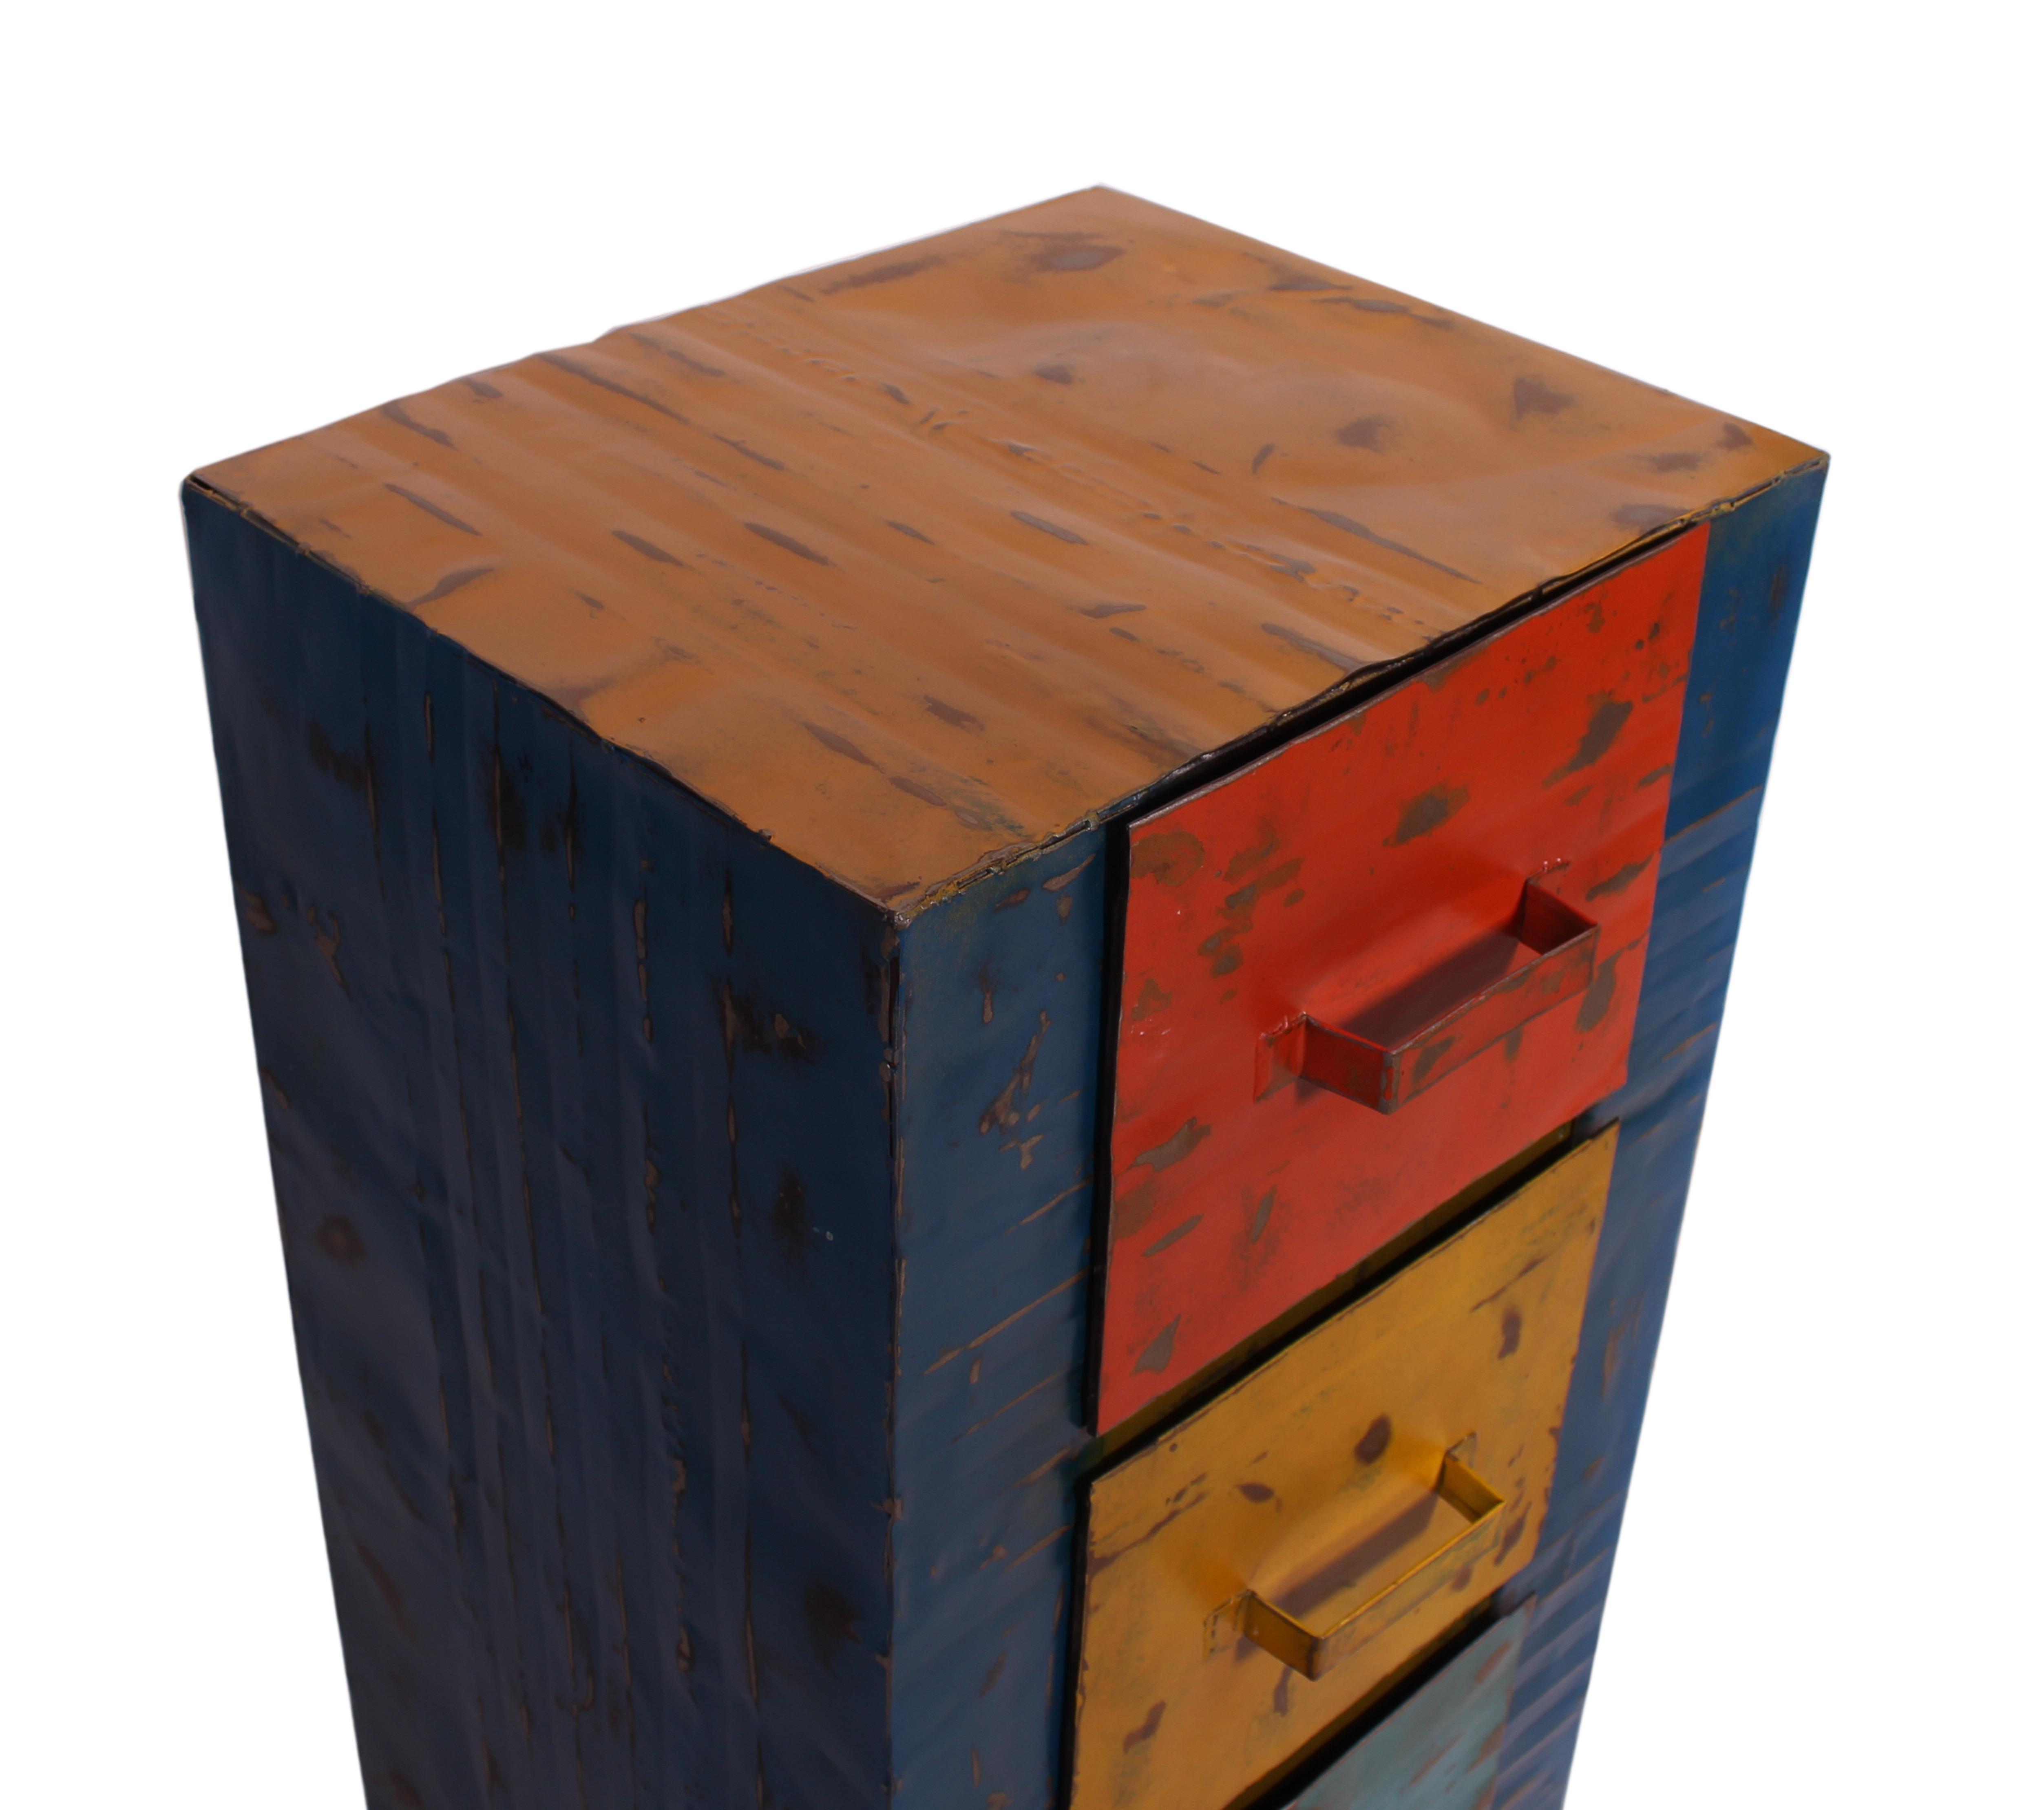 Ölfass Kommode Panum mit 3 Schubladen bunt recycelt